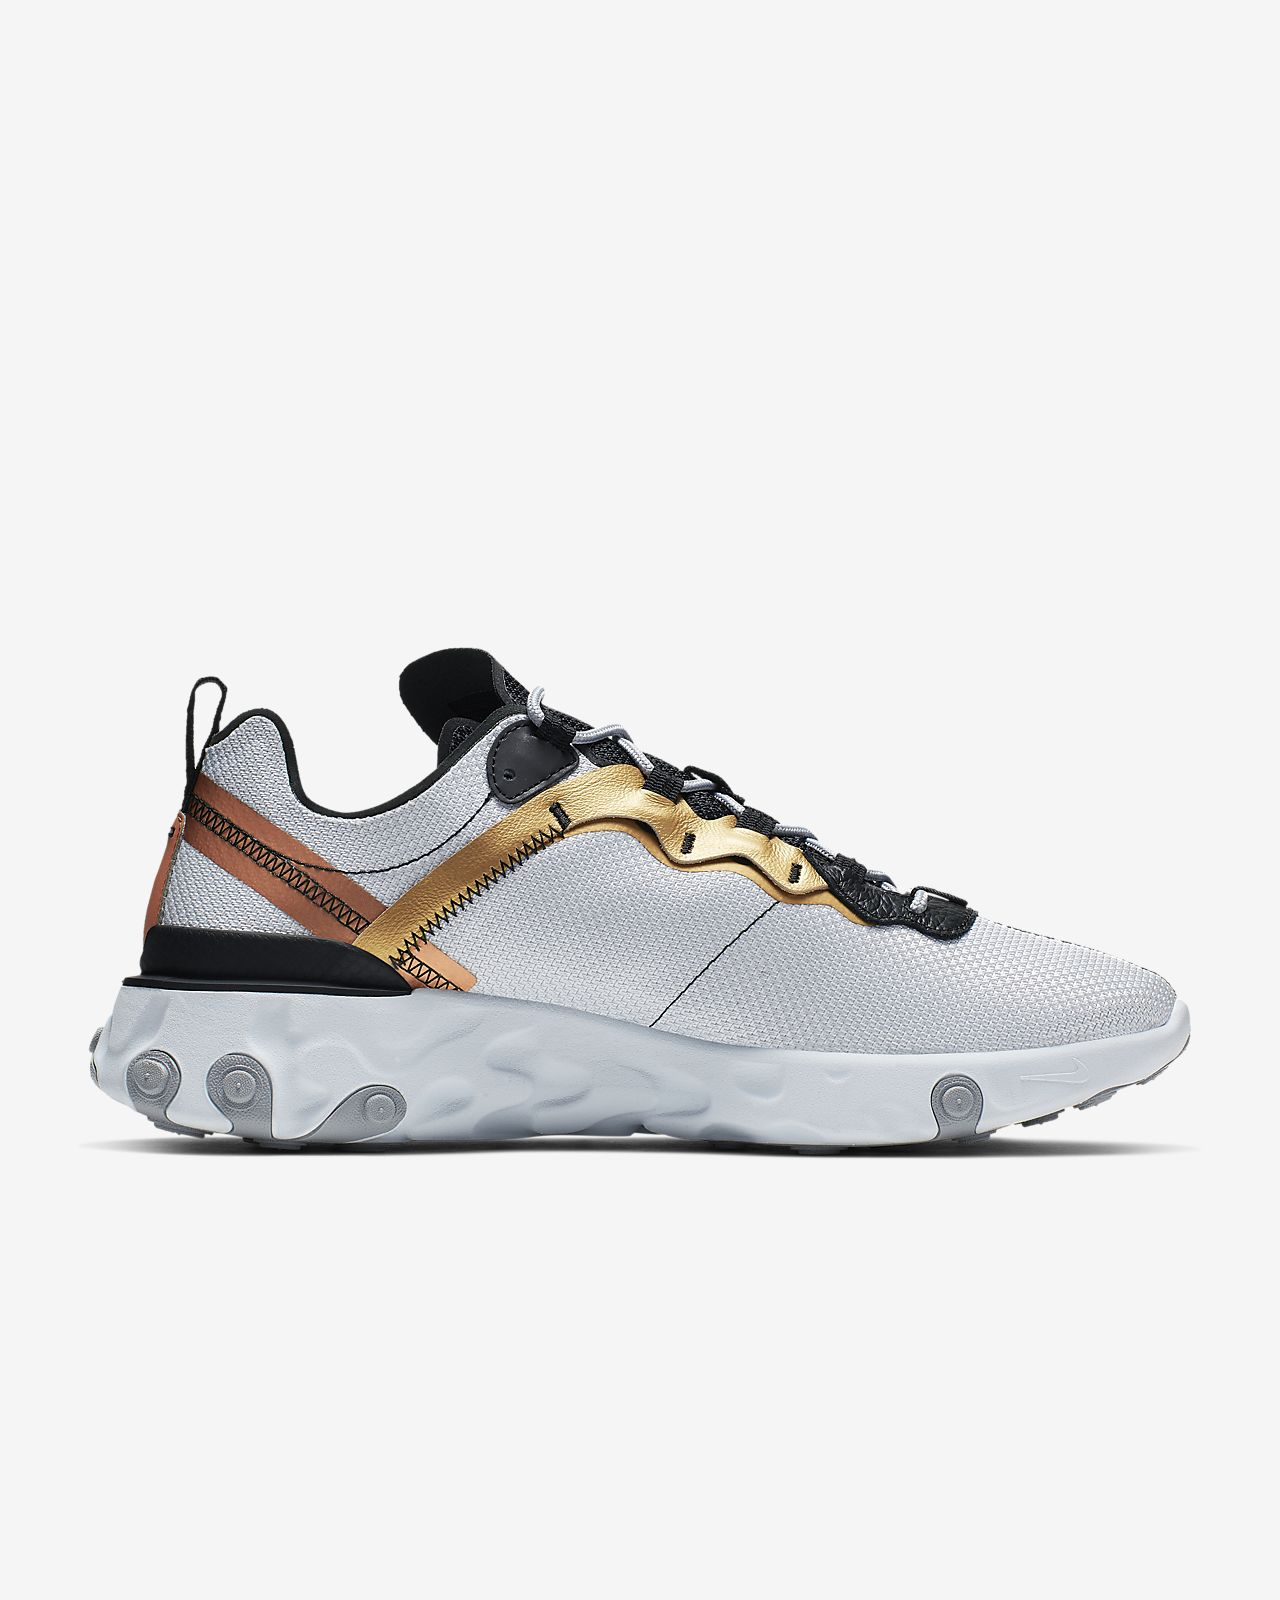 60e2d6eaba69 Nike React Element 55 Men s Shoe. Nike.com CA